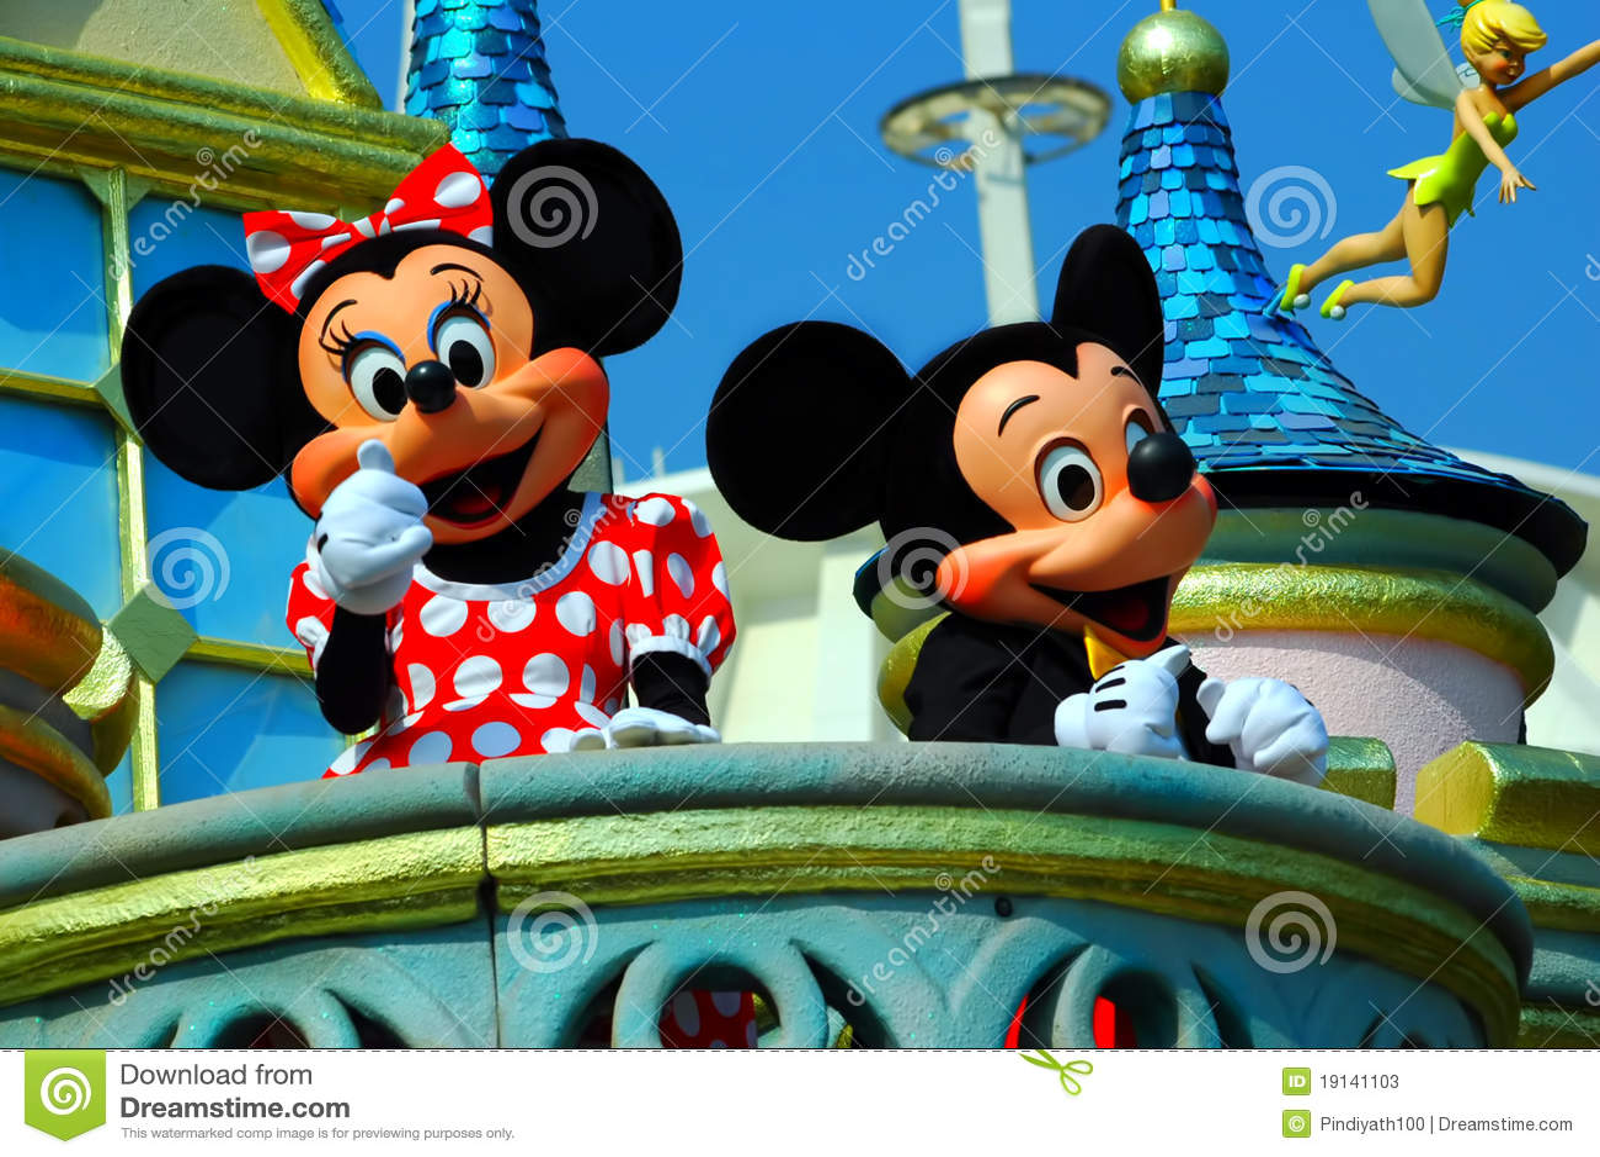 мышь minnie mickey